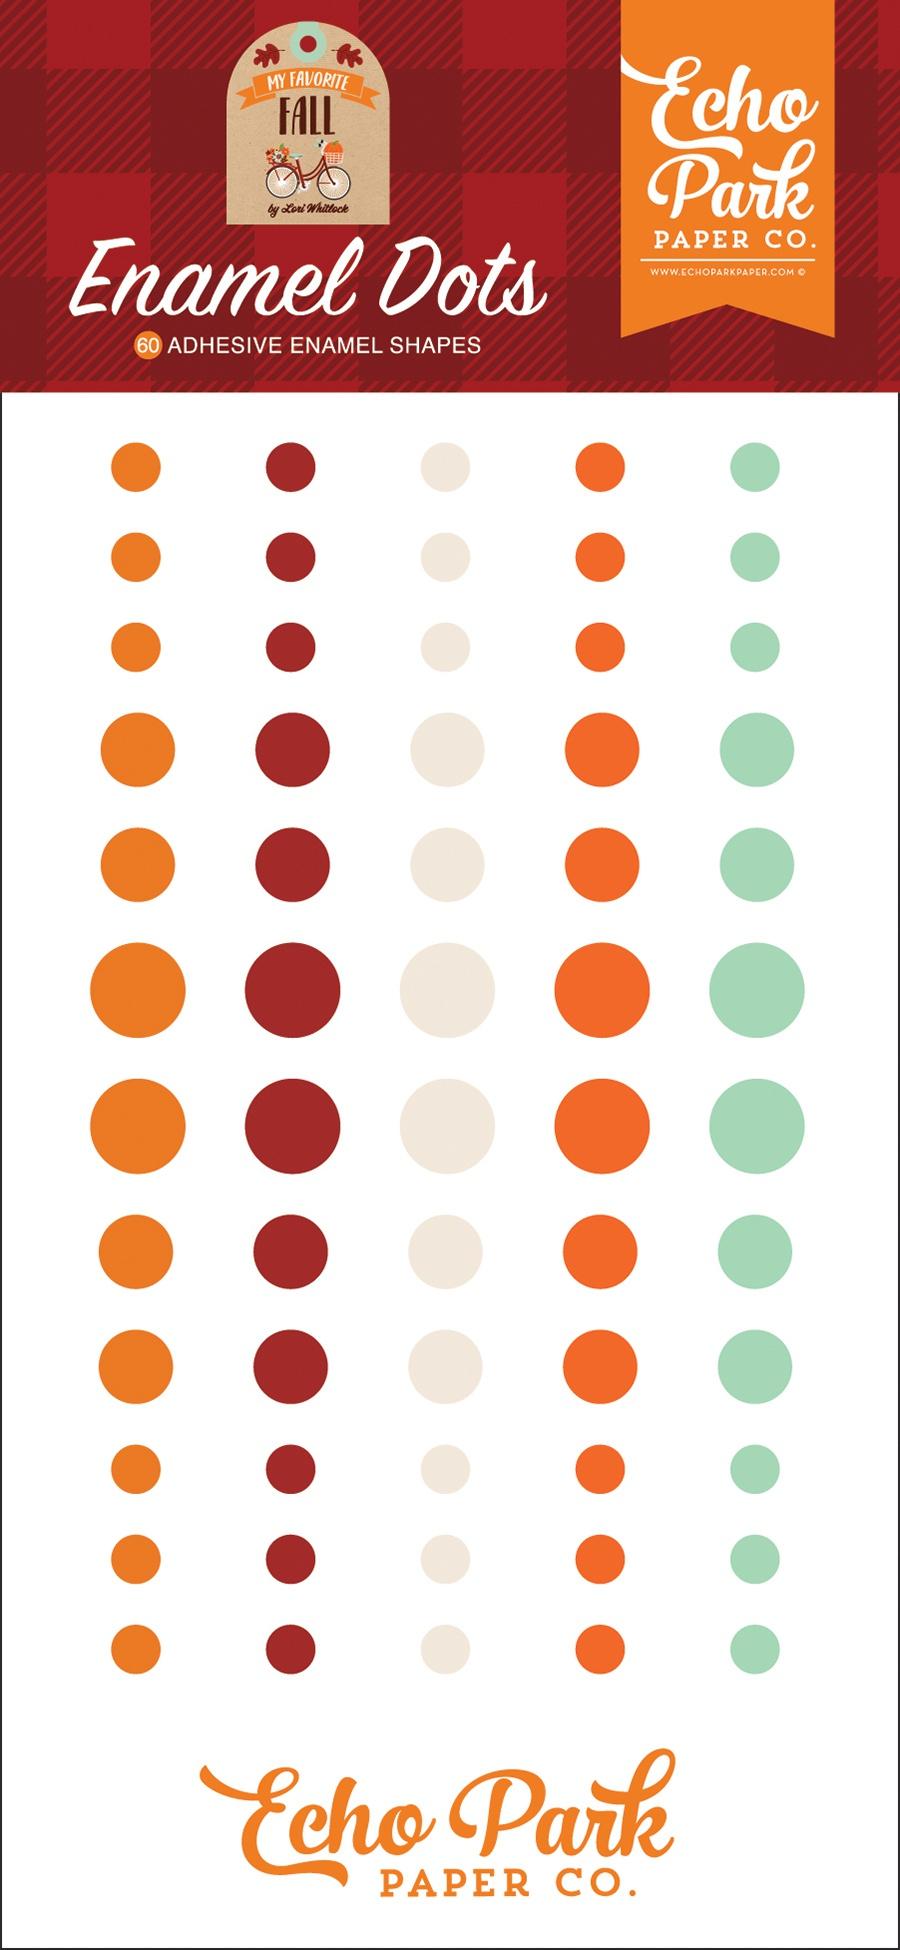 Echo Park Adhesive Enamel Dots 60/Pkg-My Favorite Fall